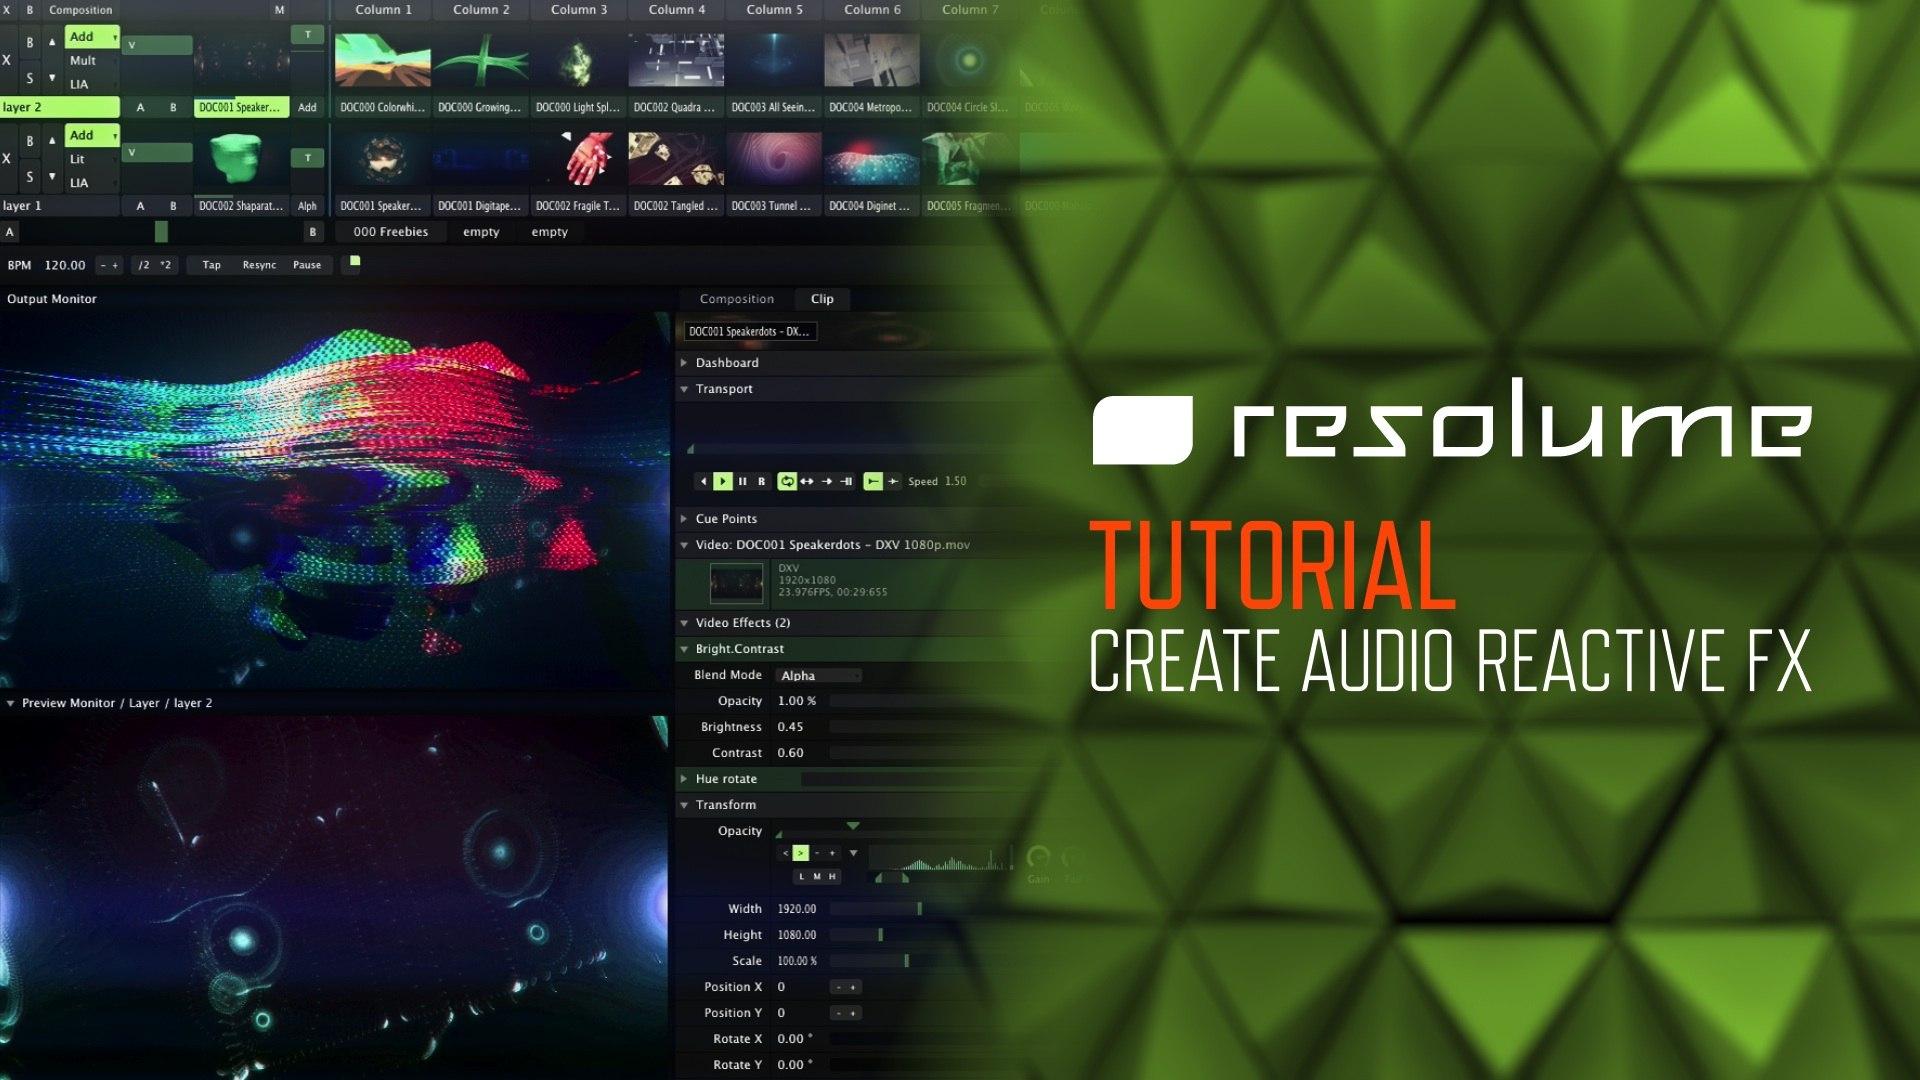 Resolume Arena & Avenue (Tutorial): Create Audio Reactive Effects